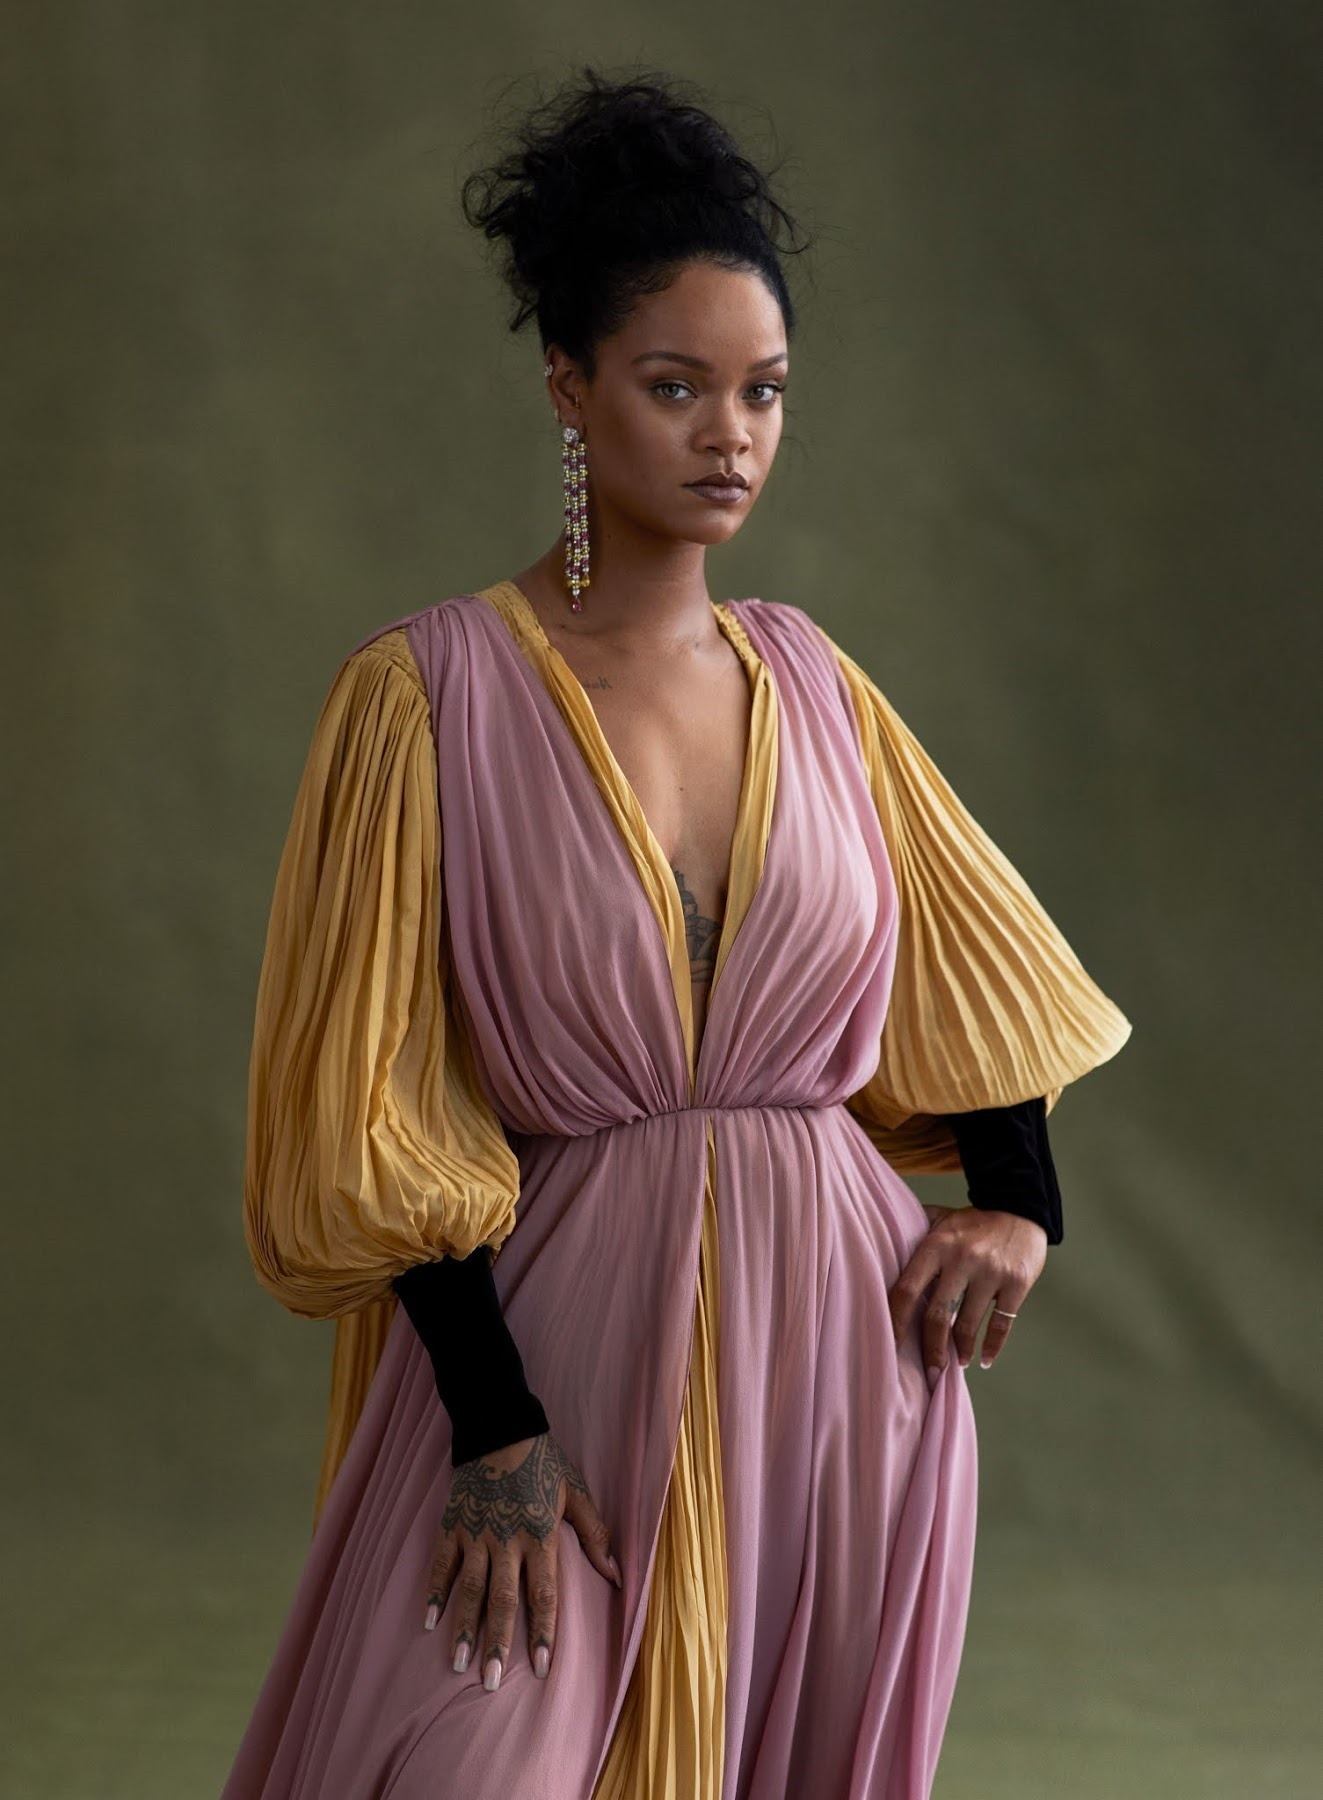 VOGUE-Rihanna-by-Ethan-James-Green.-Tonne-Goodman-November-2019-www.imageamplified.com-Image-Amp-9